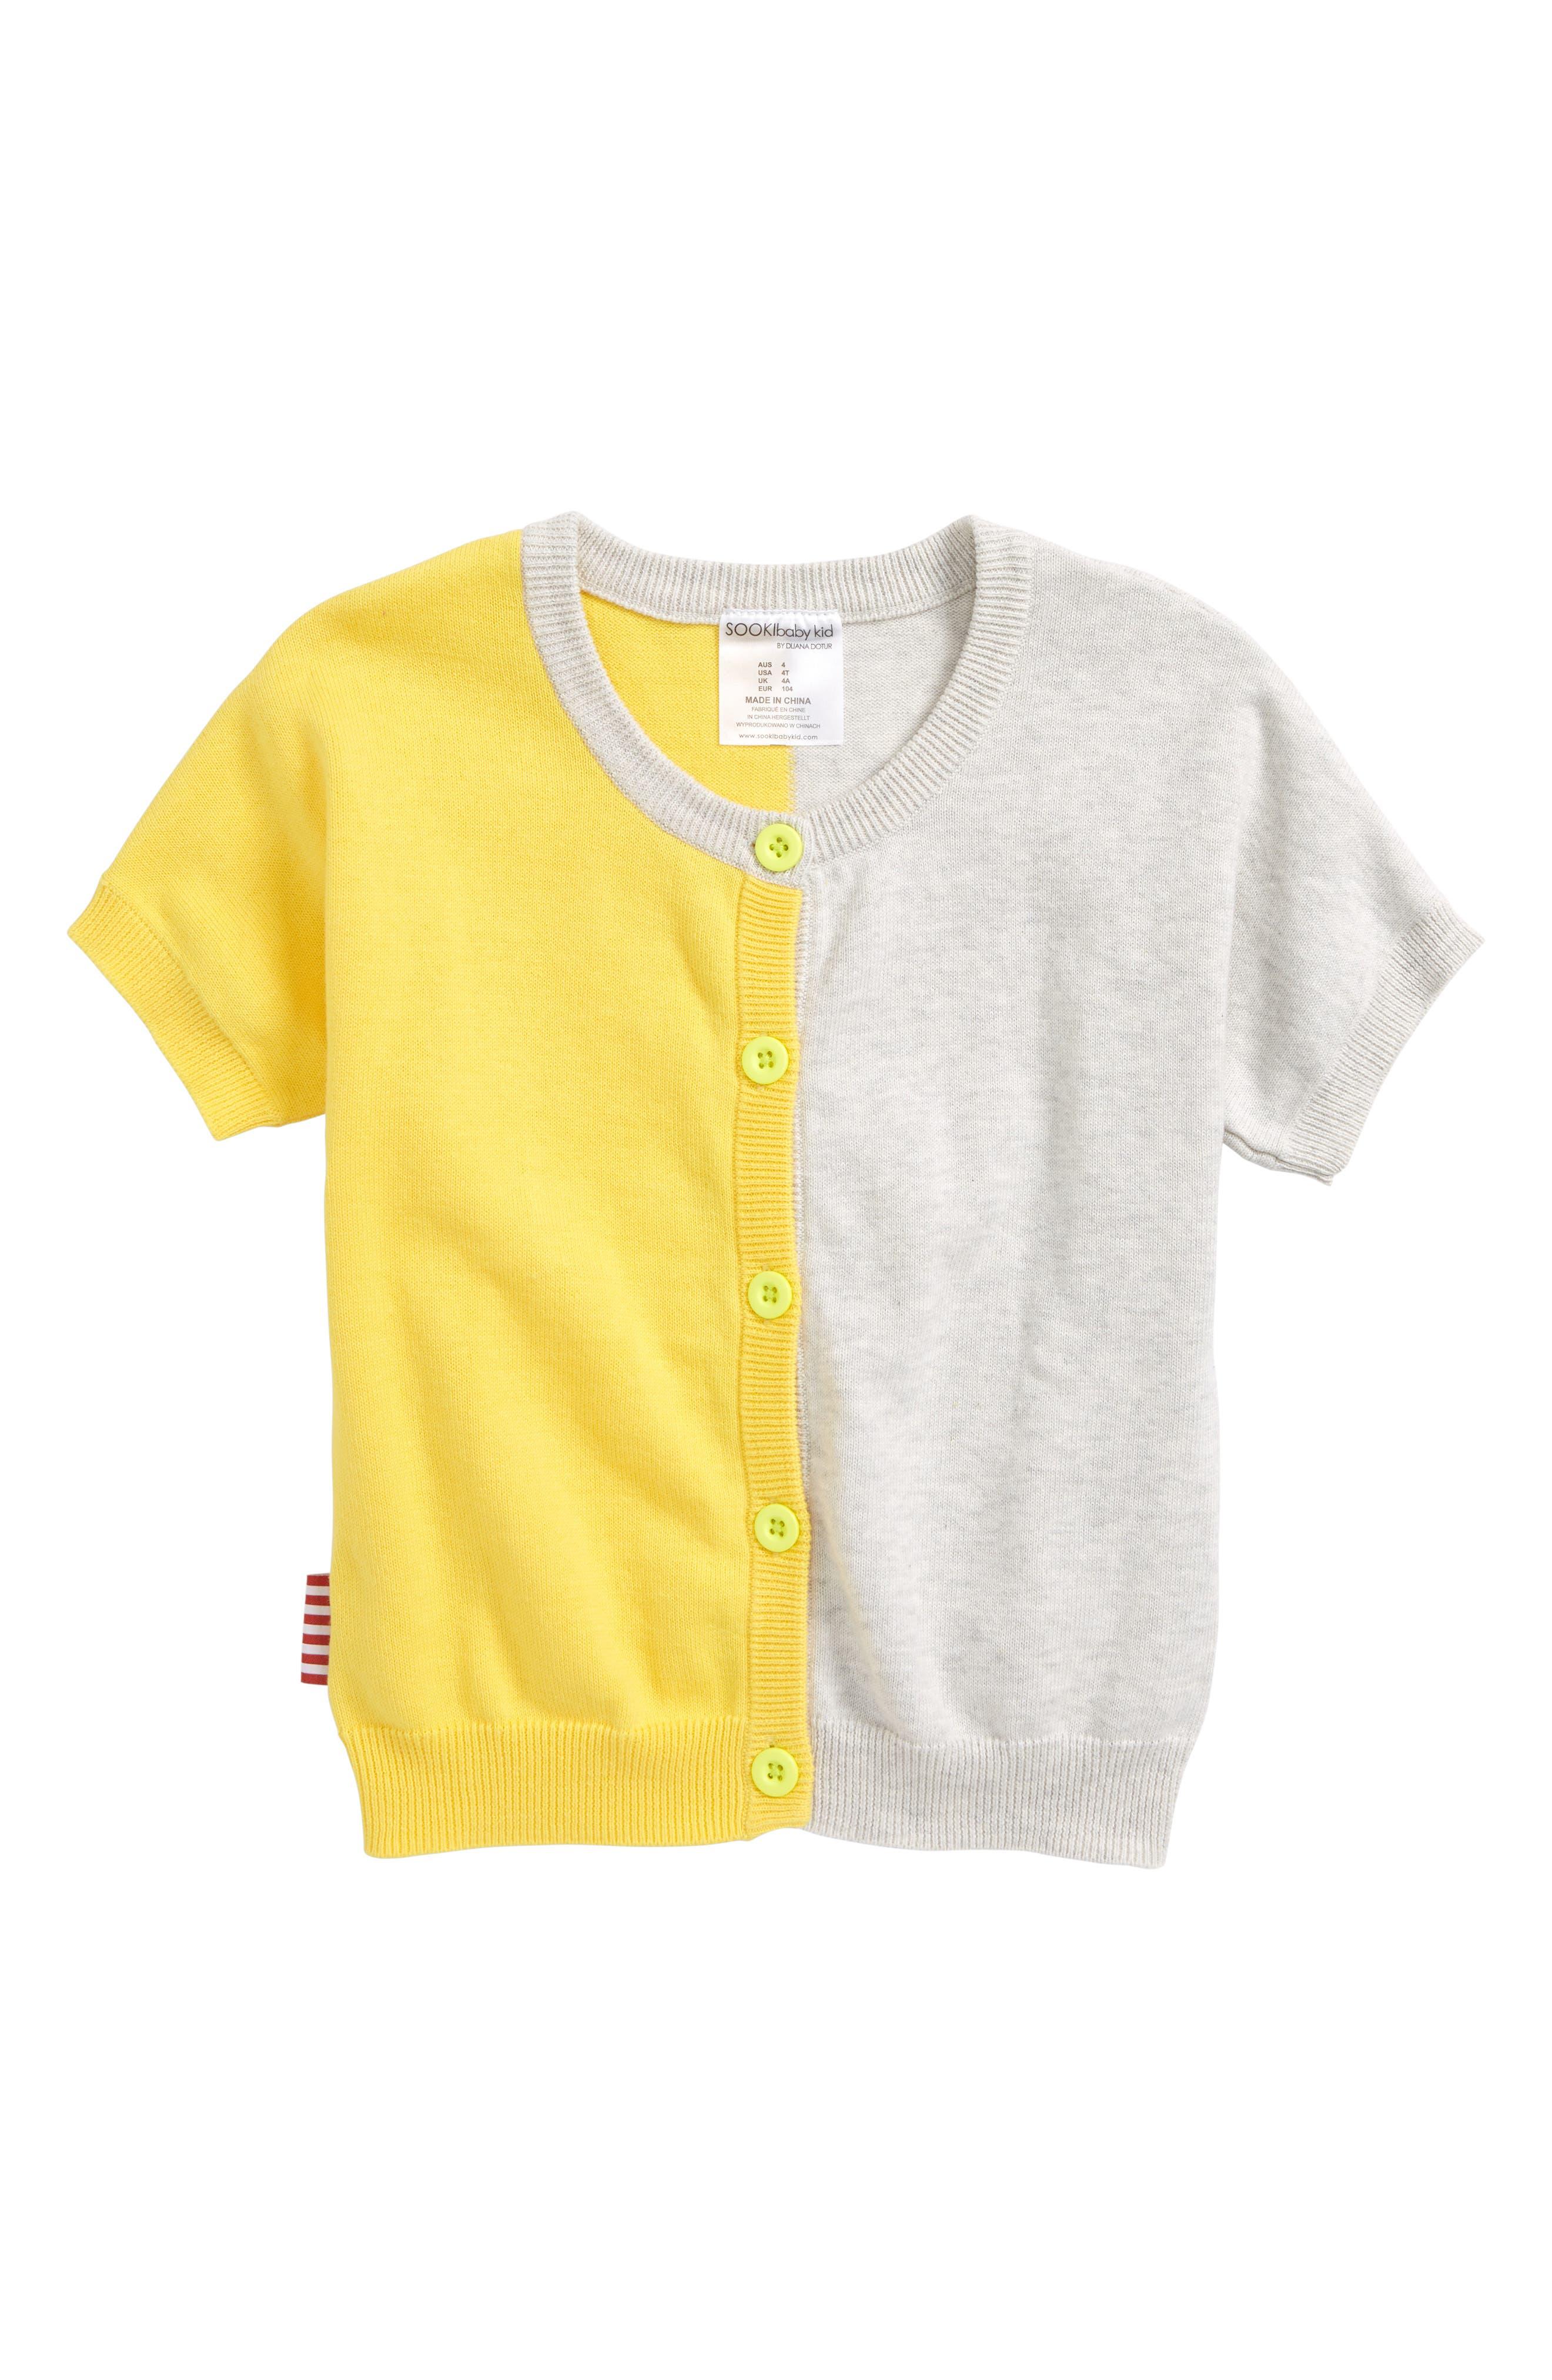 Alternate Image 1 Selected - SOOKIbaby True Knit Lemon Cardigan (Baby & Toddler)